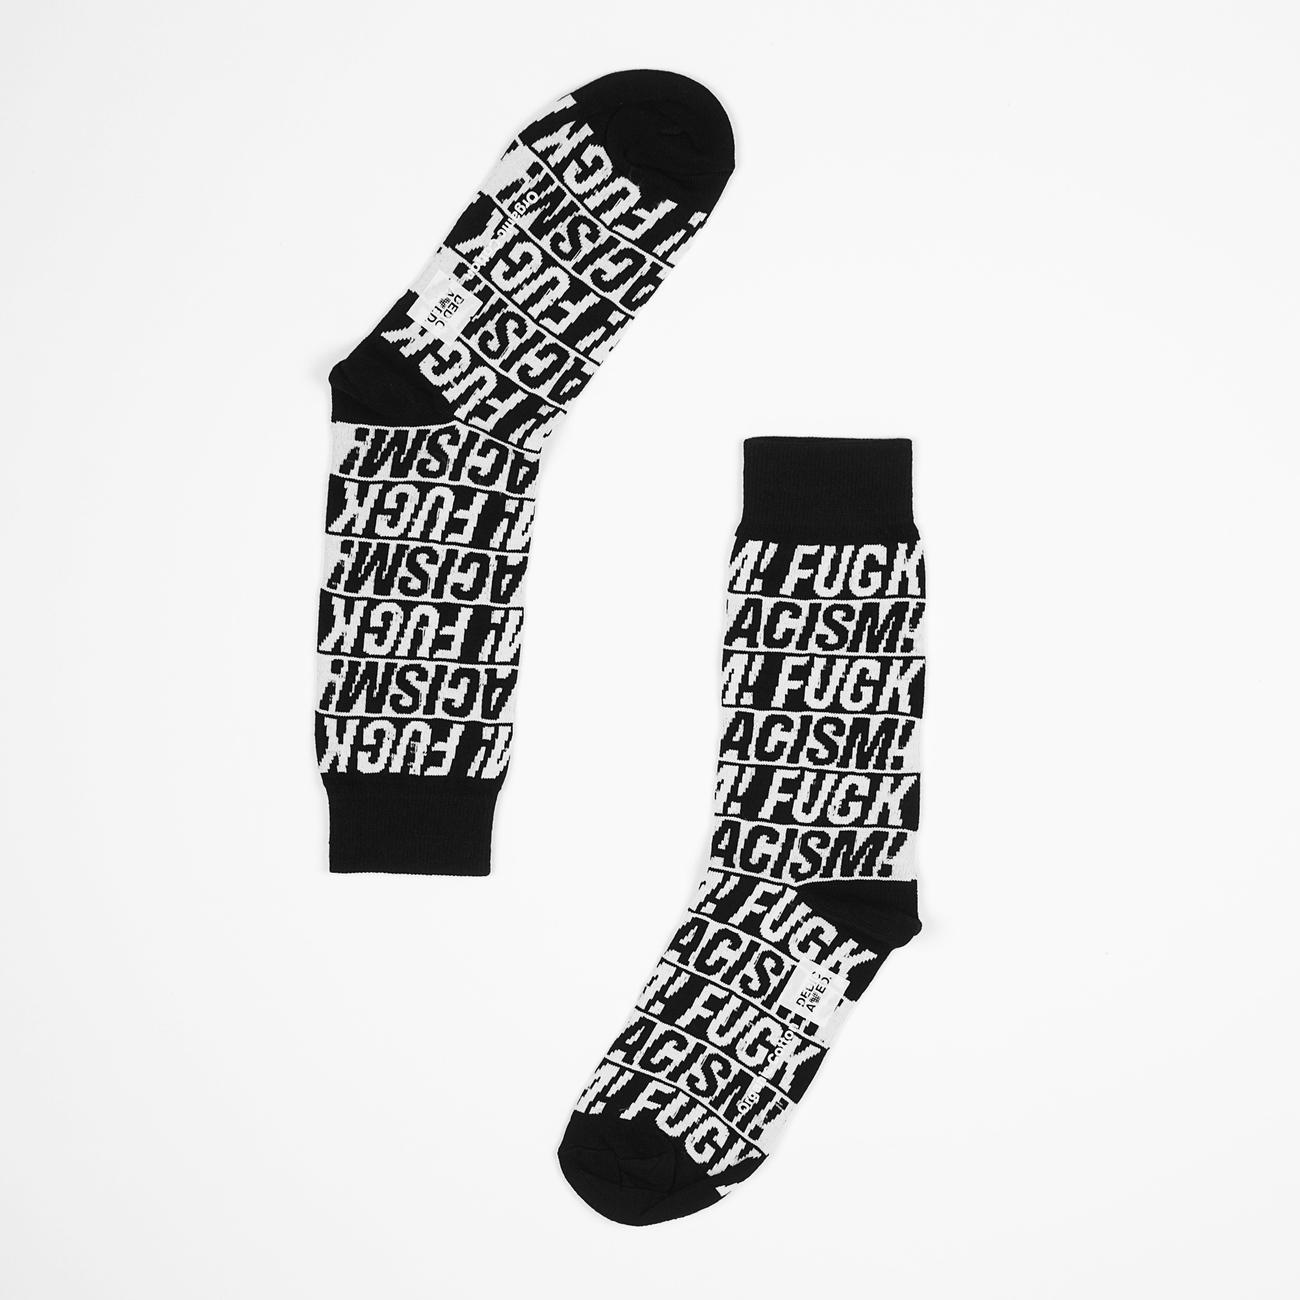 Socks Sigtuna Fuck Racism Black